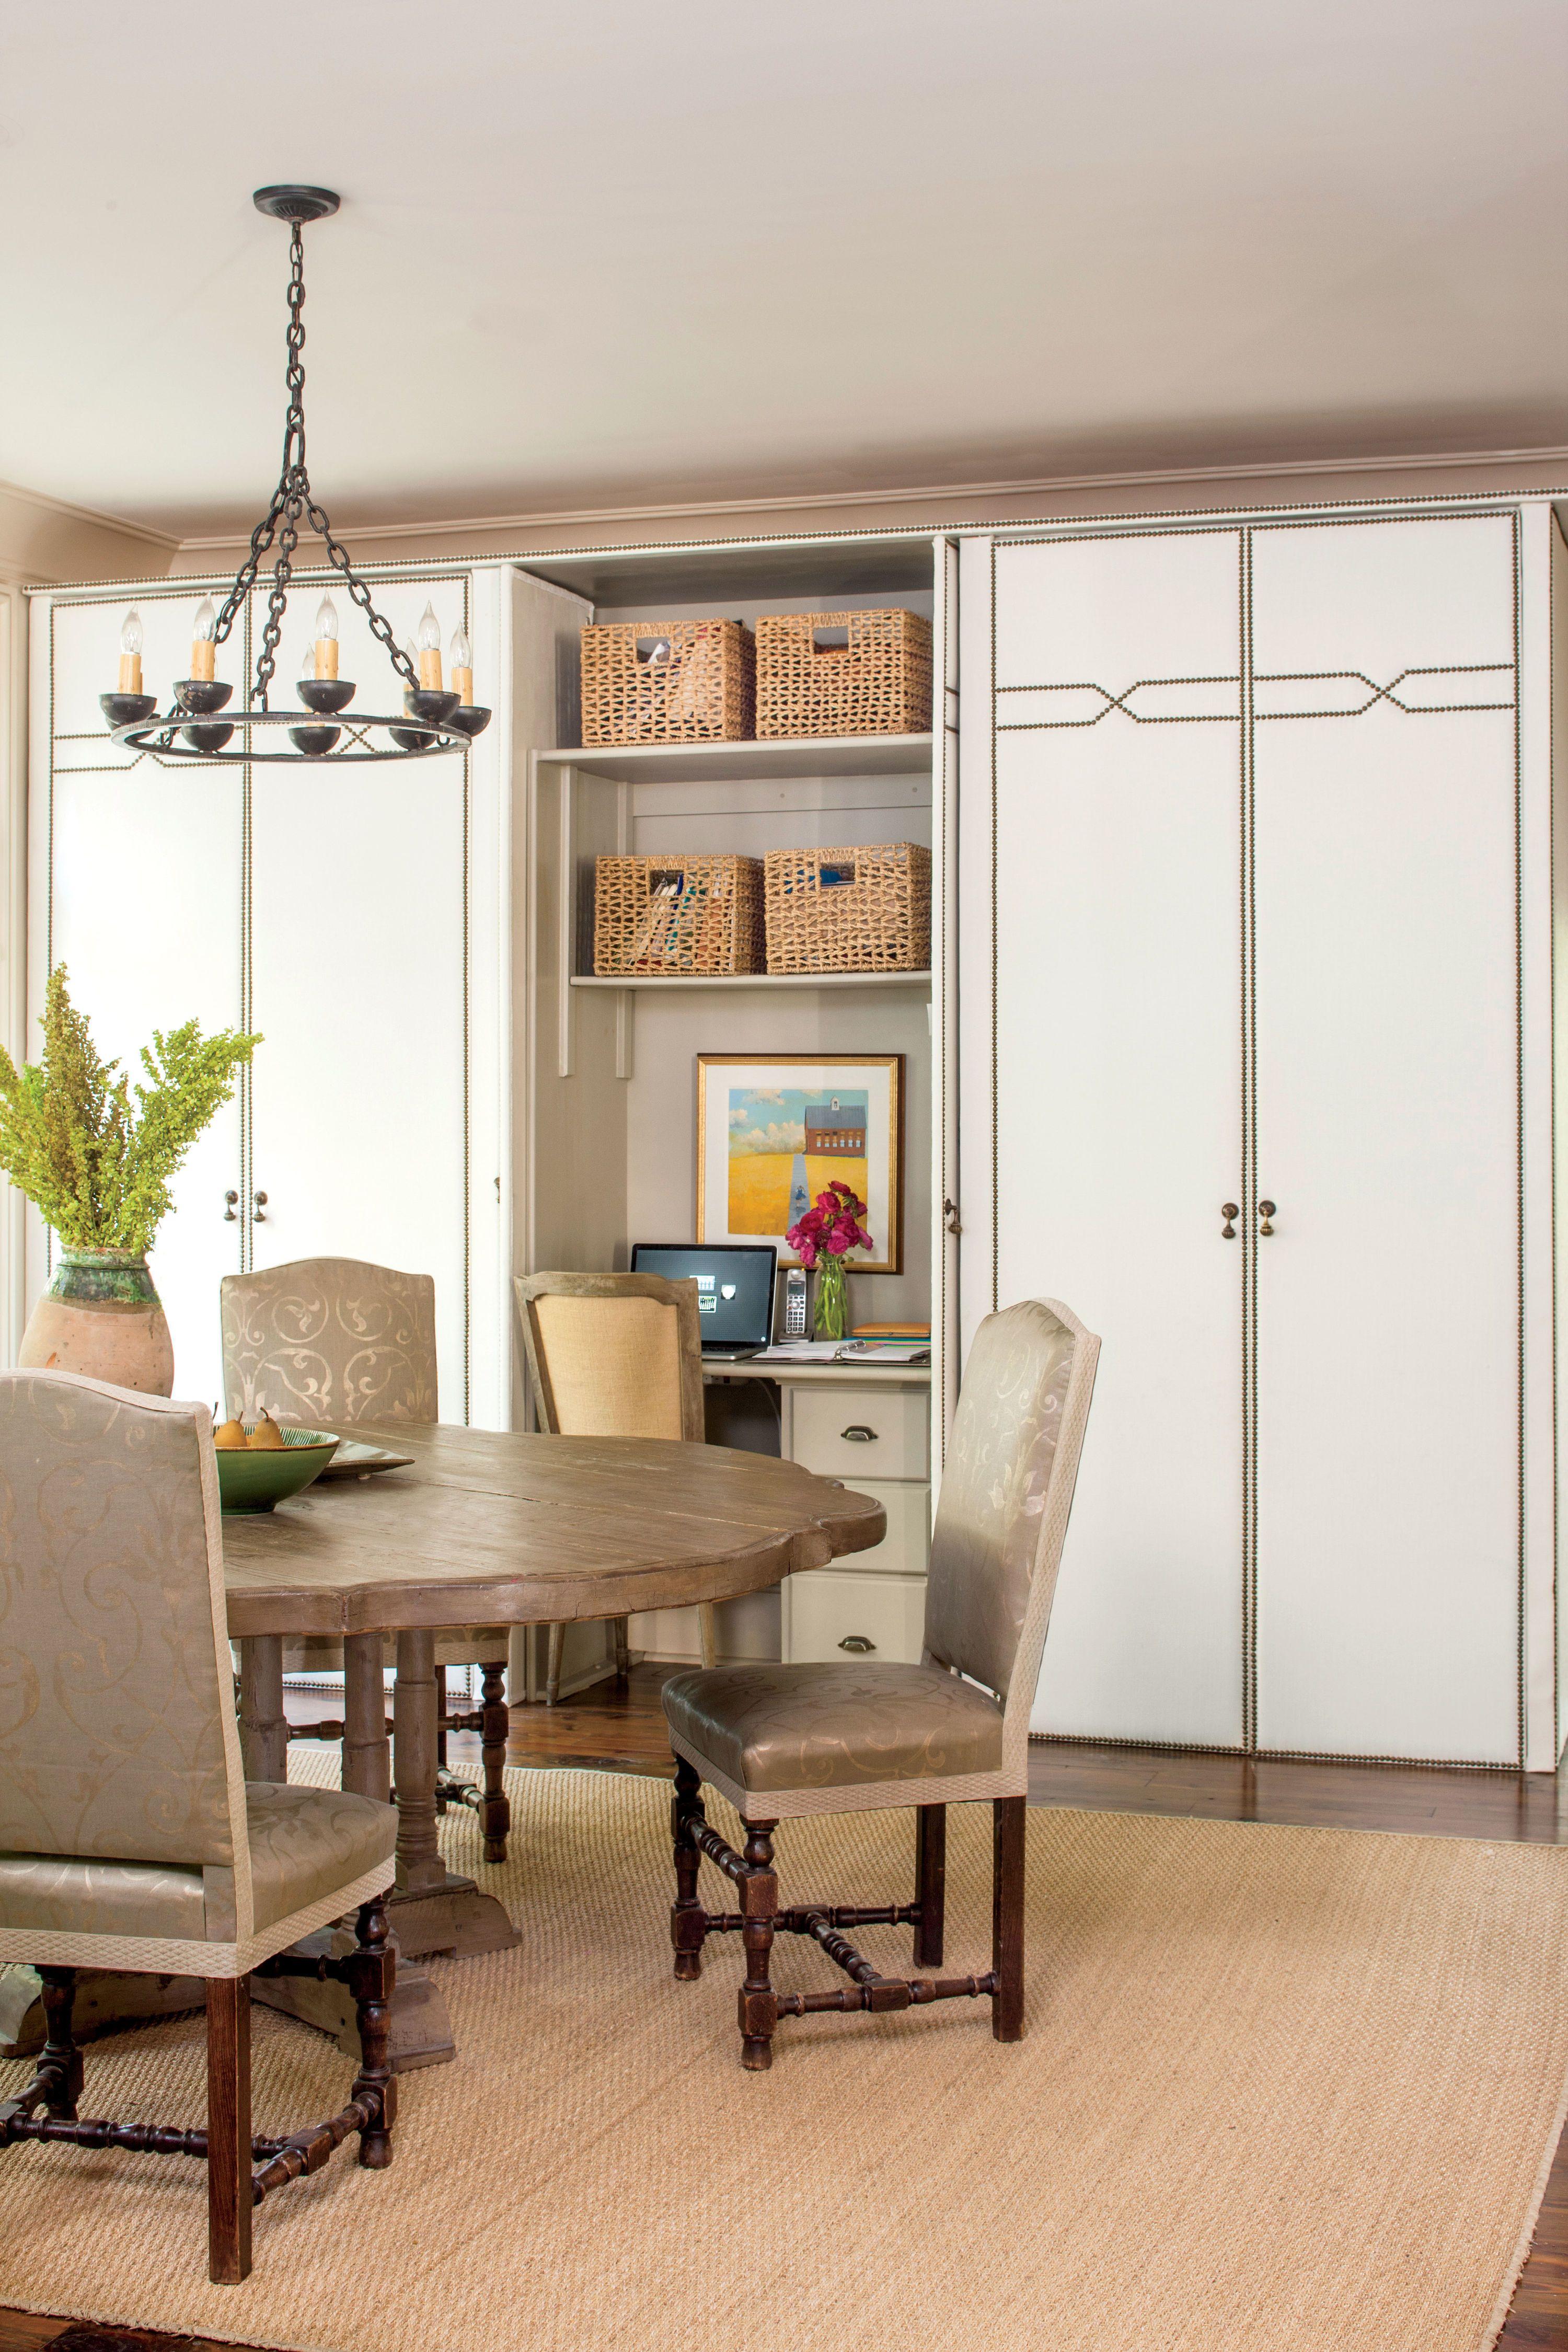 Dining Room Closet Ideas Neutral Breakfast Room With Storage  Kitchen Ideas  Pinterest